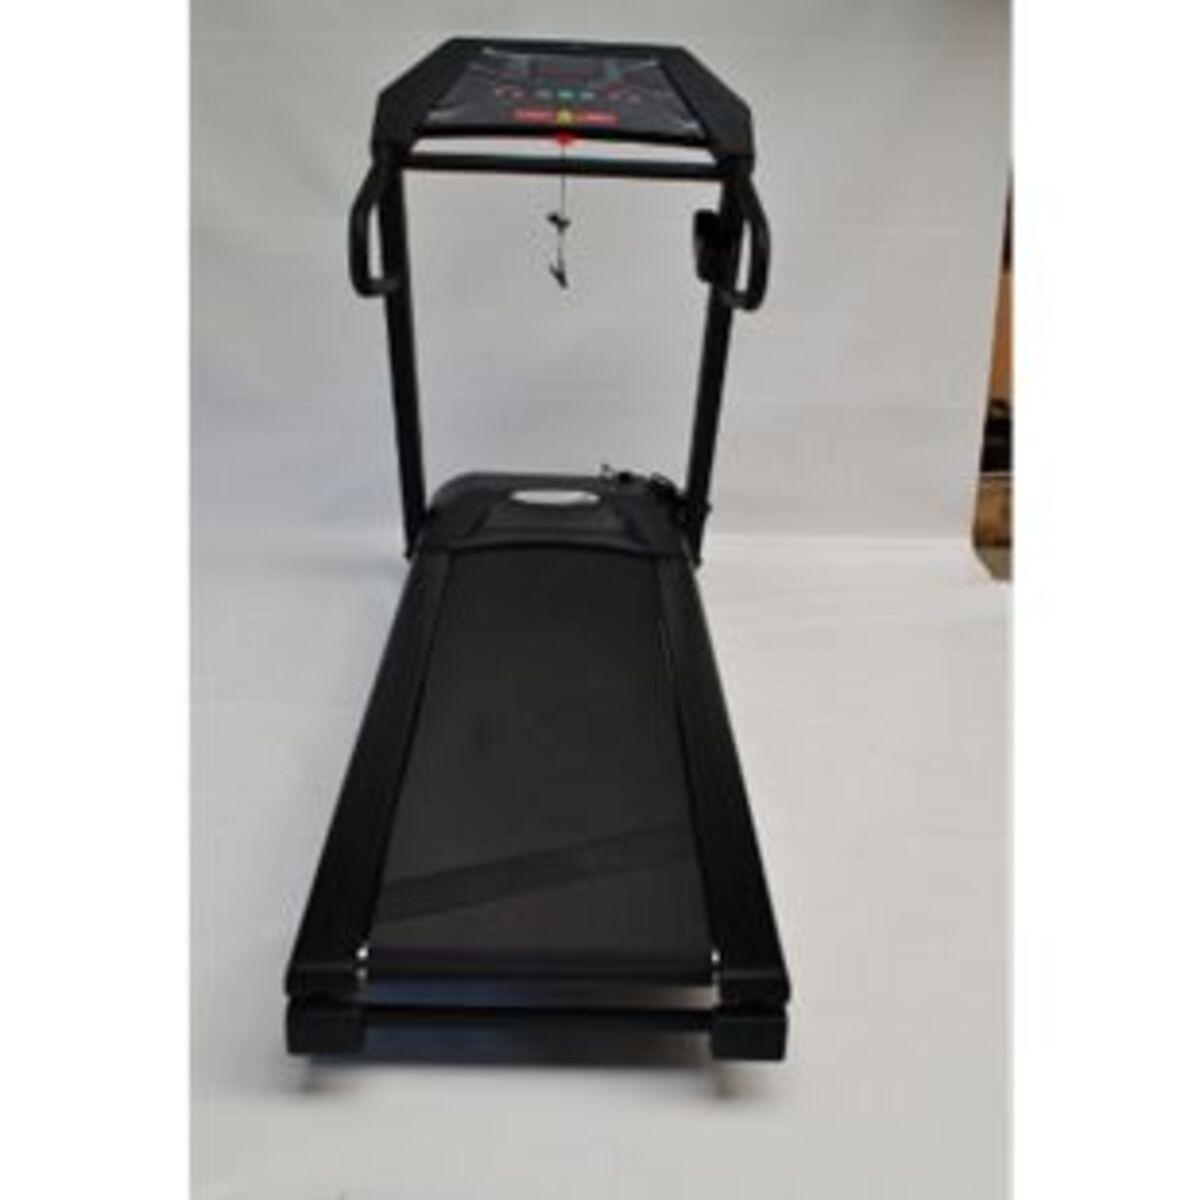 Bild 2 von Steelflex Treadmill XT-6800 Laufband